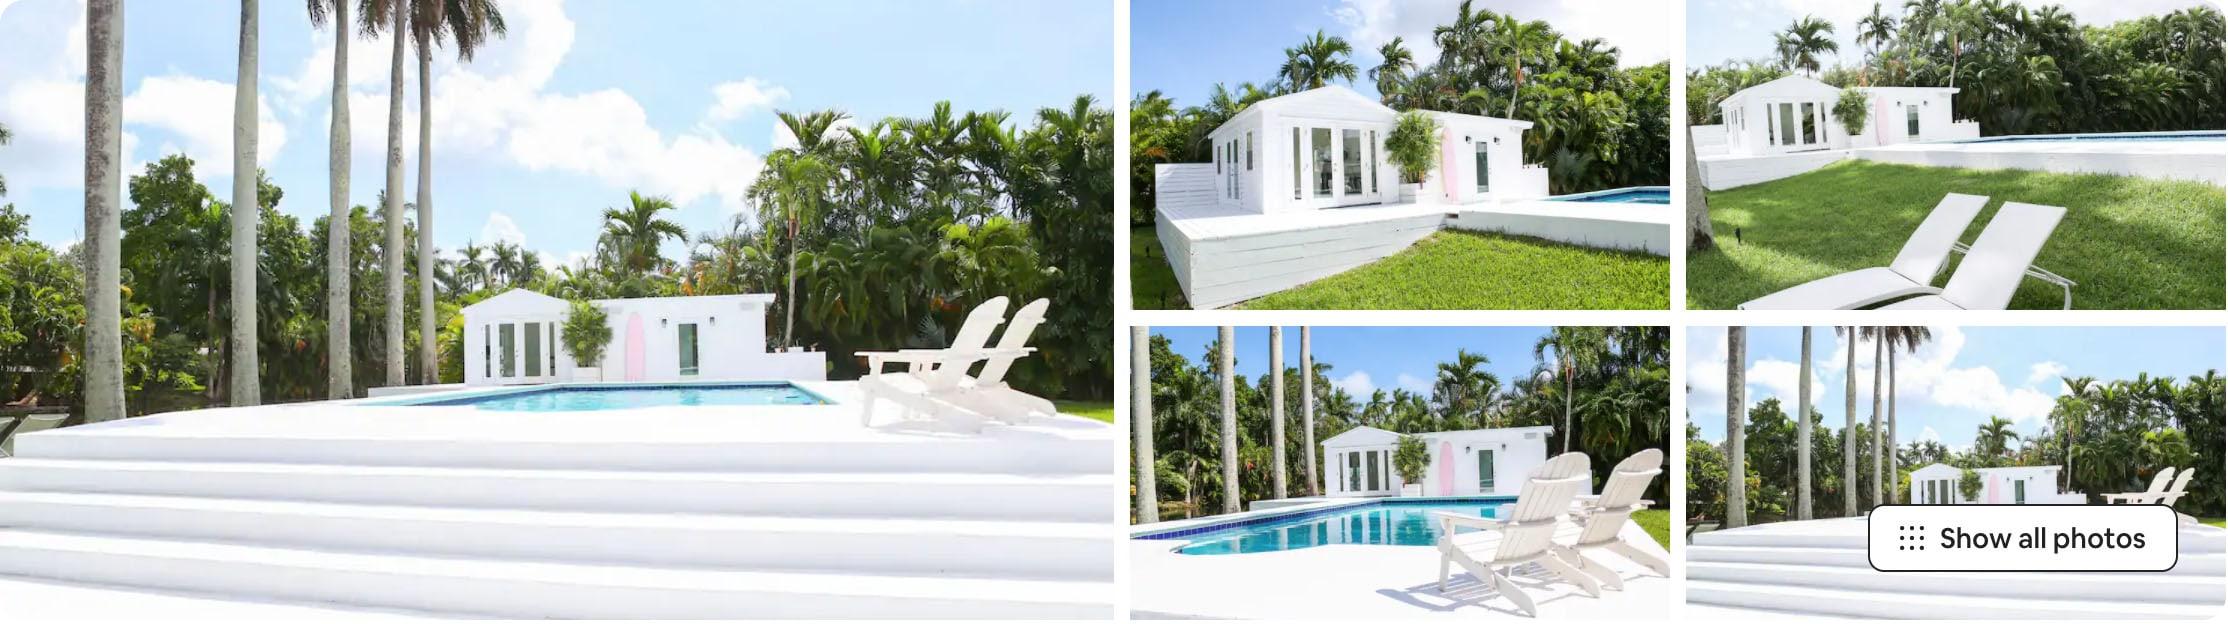 airbnb wedding venues in florida - Miami Airbnb